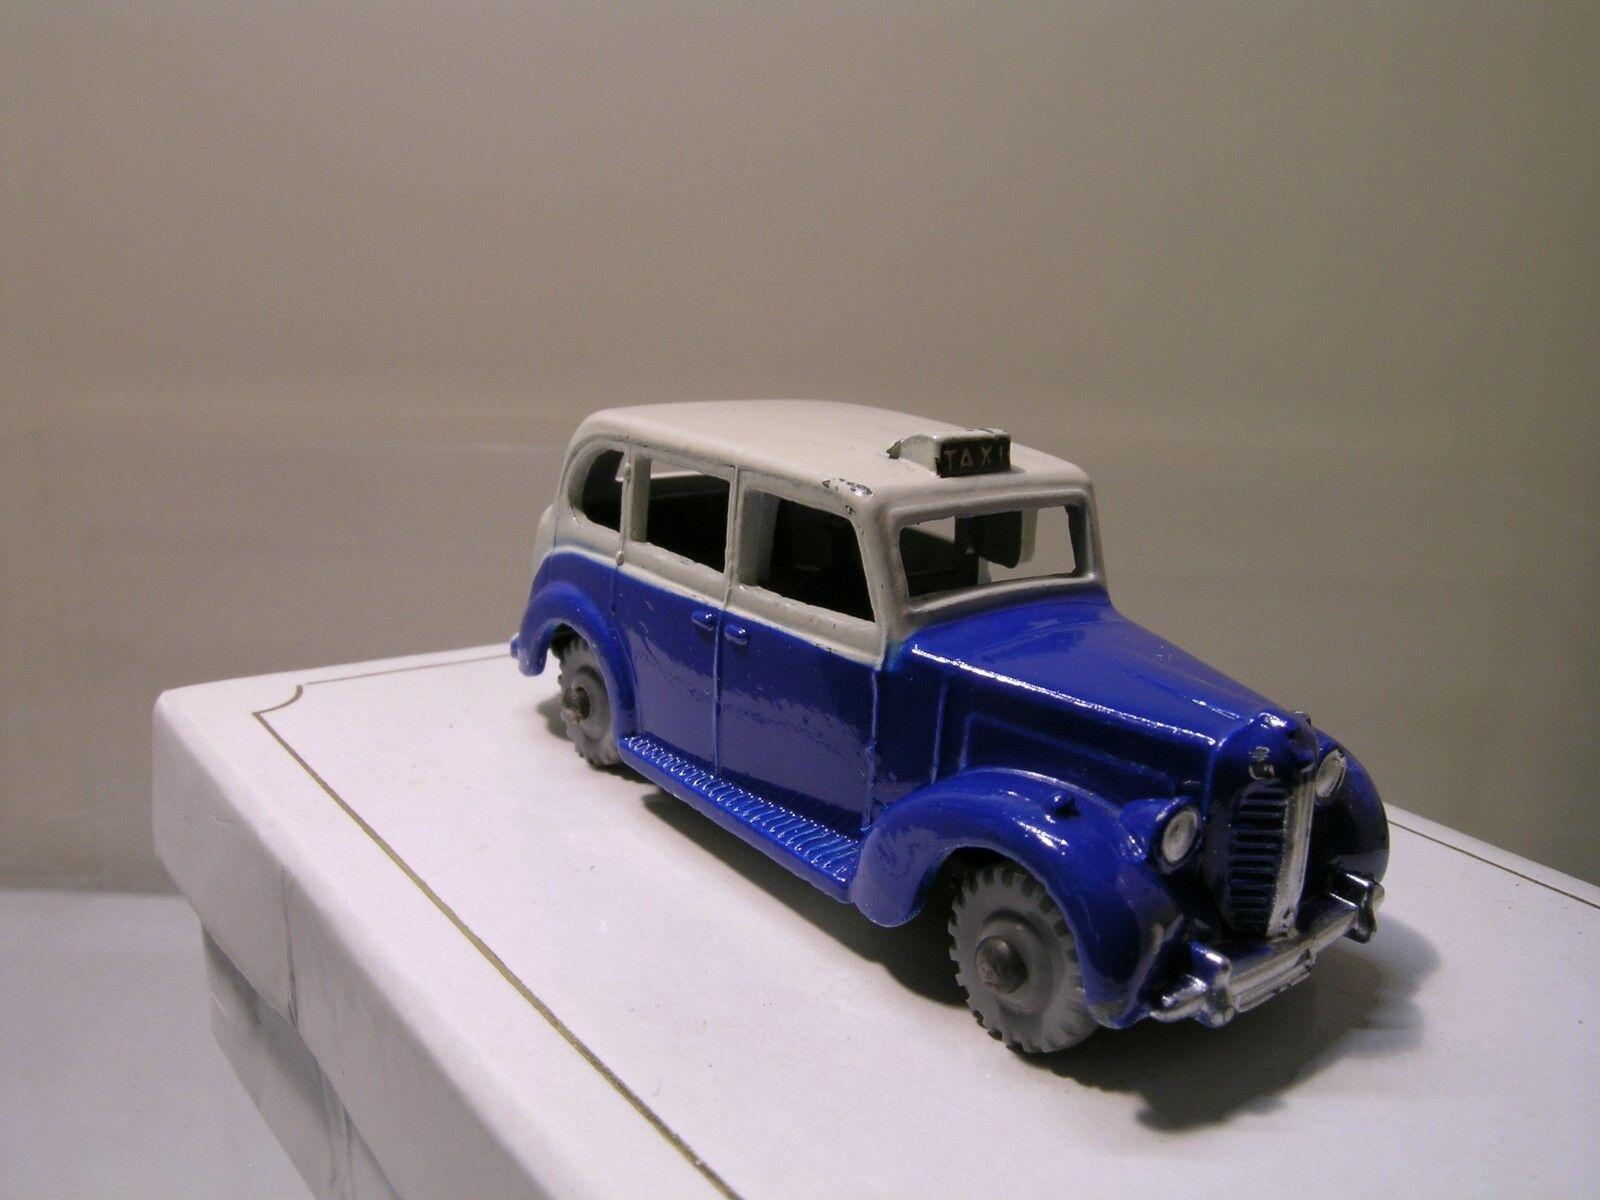 DINKY TOYS DUBLO UK 067 AUSTIN TAXI FX3 1959 bleu CREAM SCALE 00   1 76